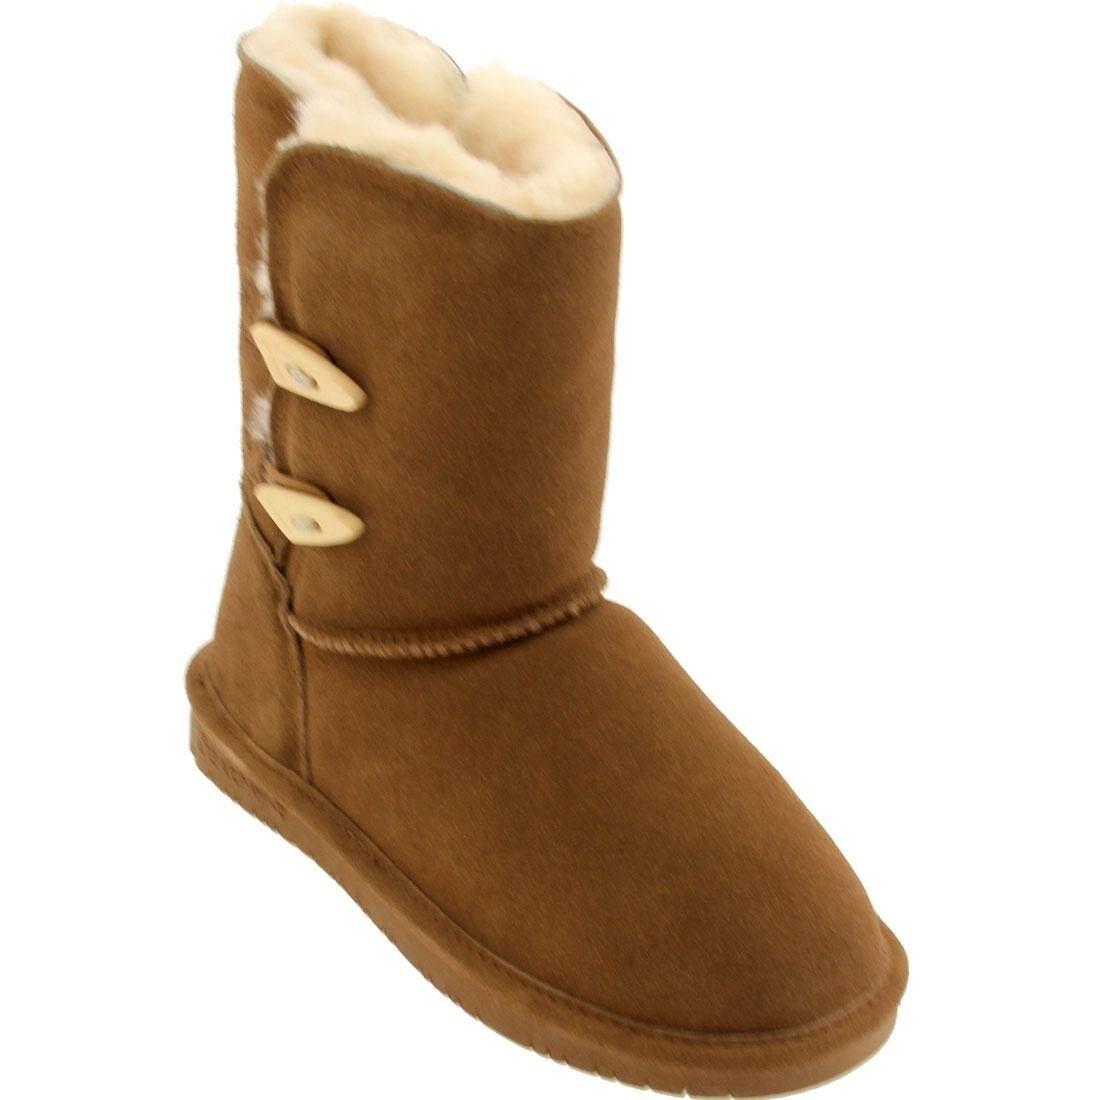 85 Bearpaw Damens Abigail Boot (Braun / hickory) 682WHCKY